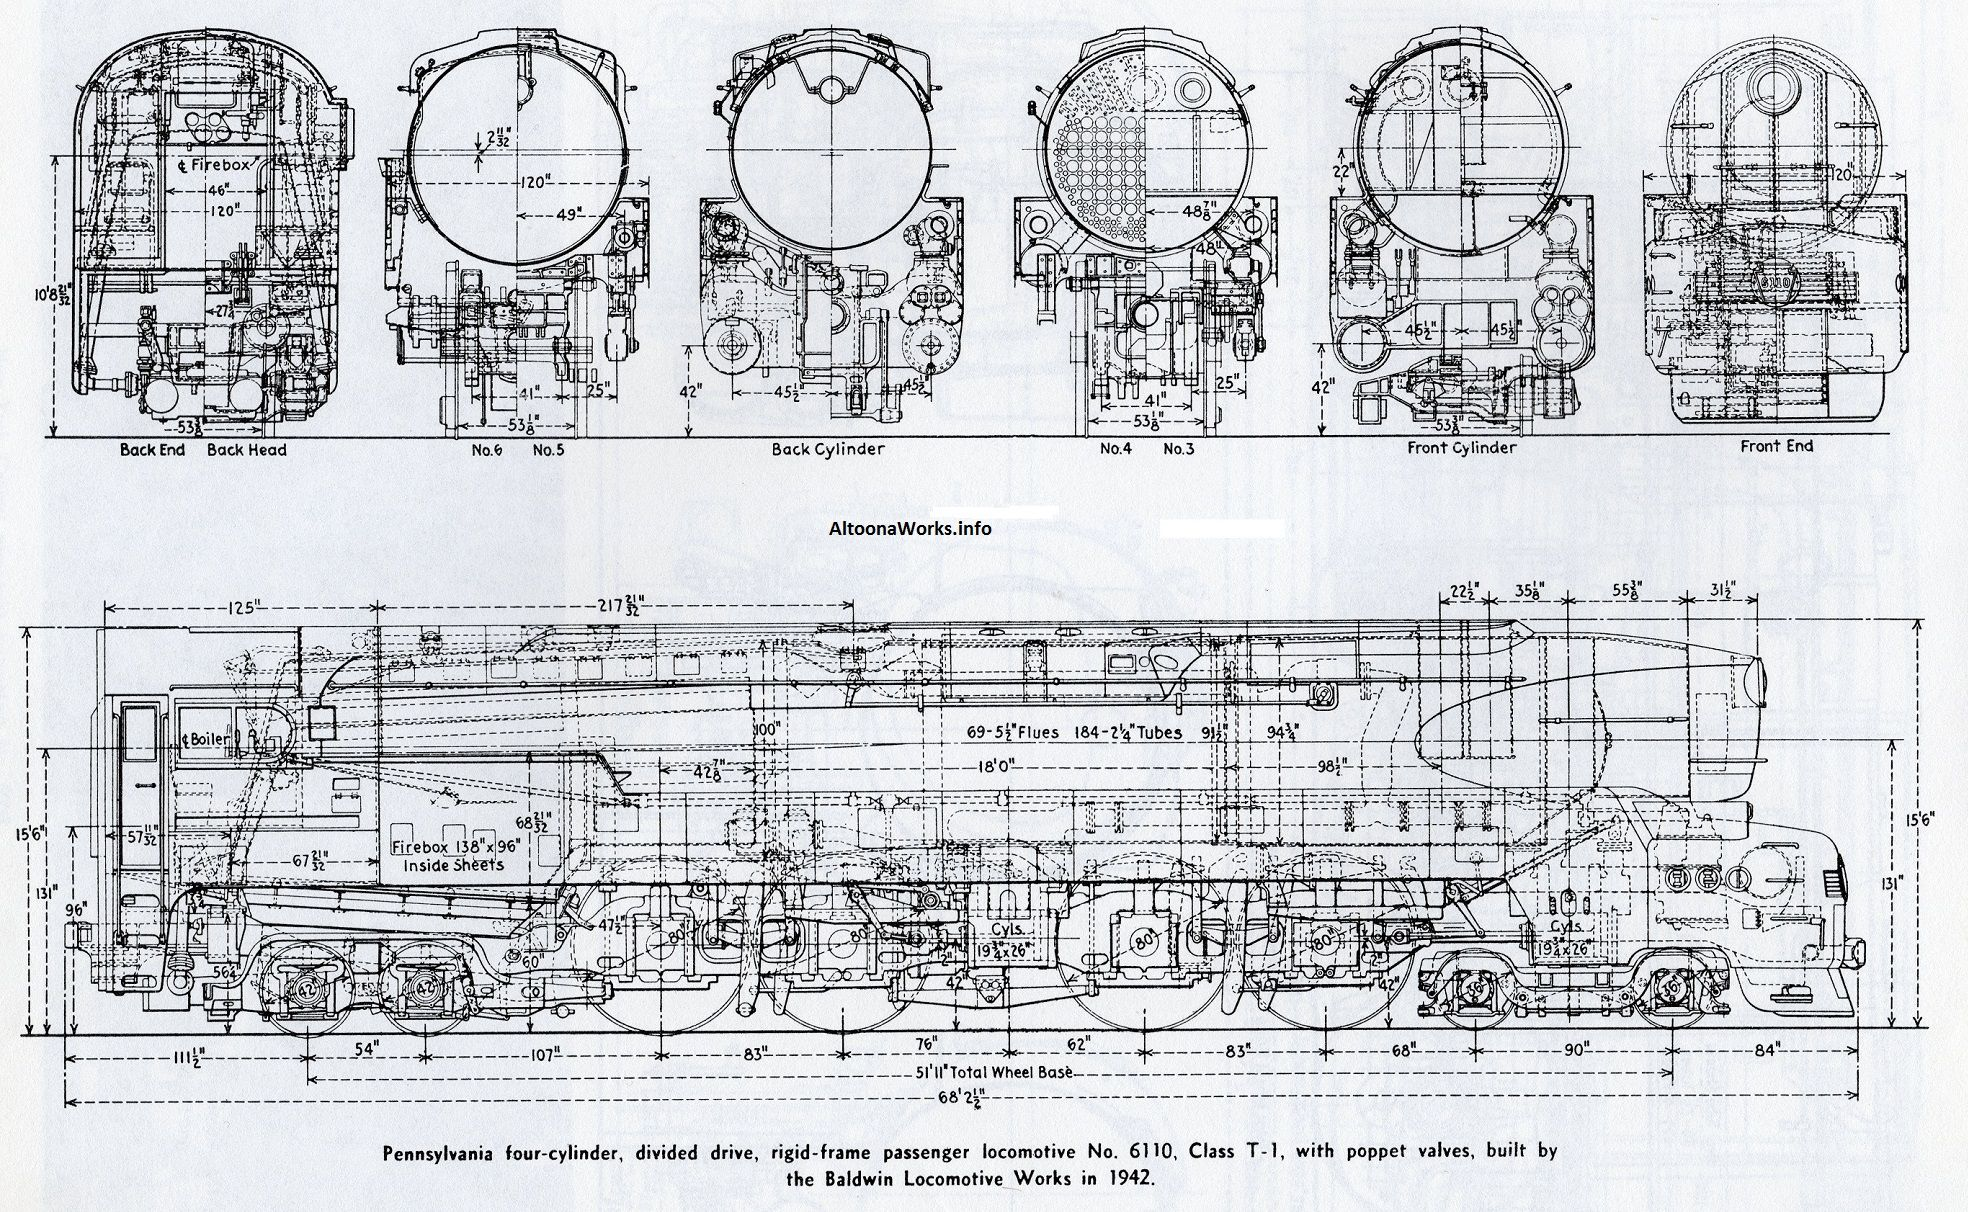 hight resolution of pennsylvania t 1 4 4 4 4 baldwin 1942 locomotive cutaways prr barge diagram